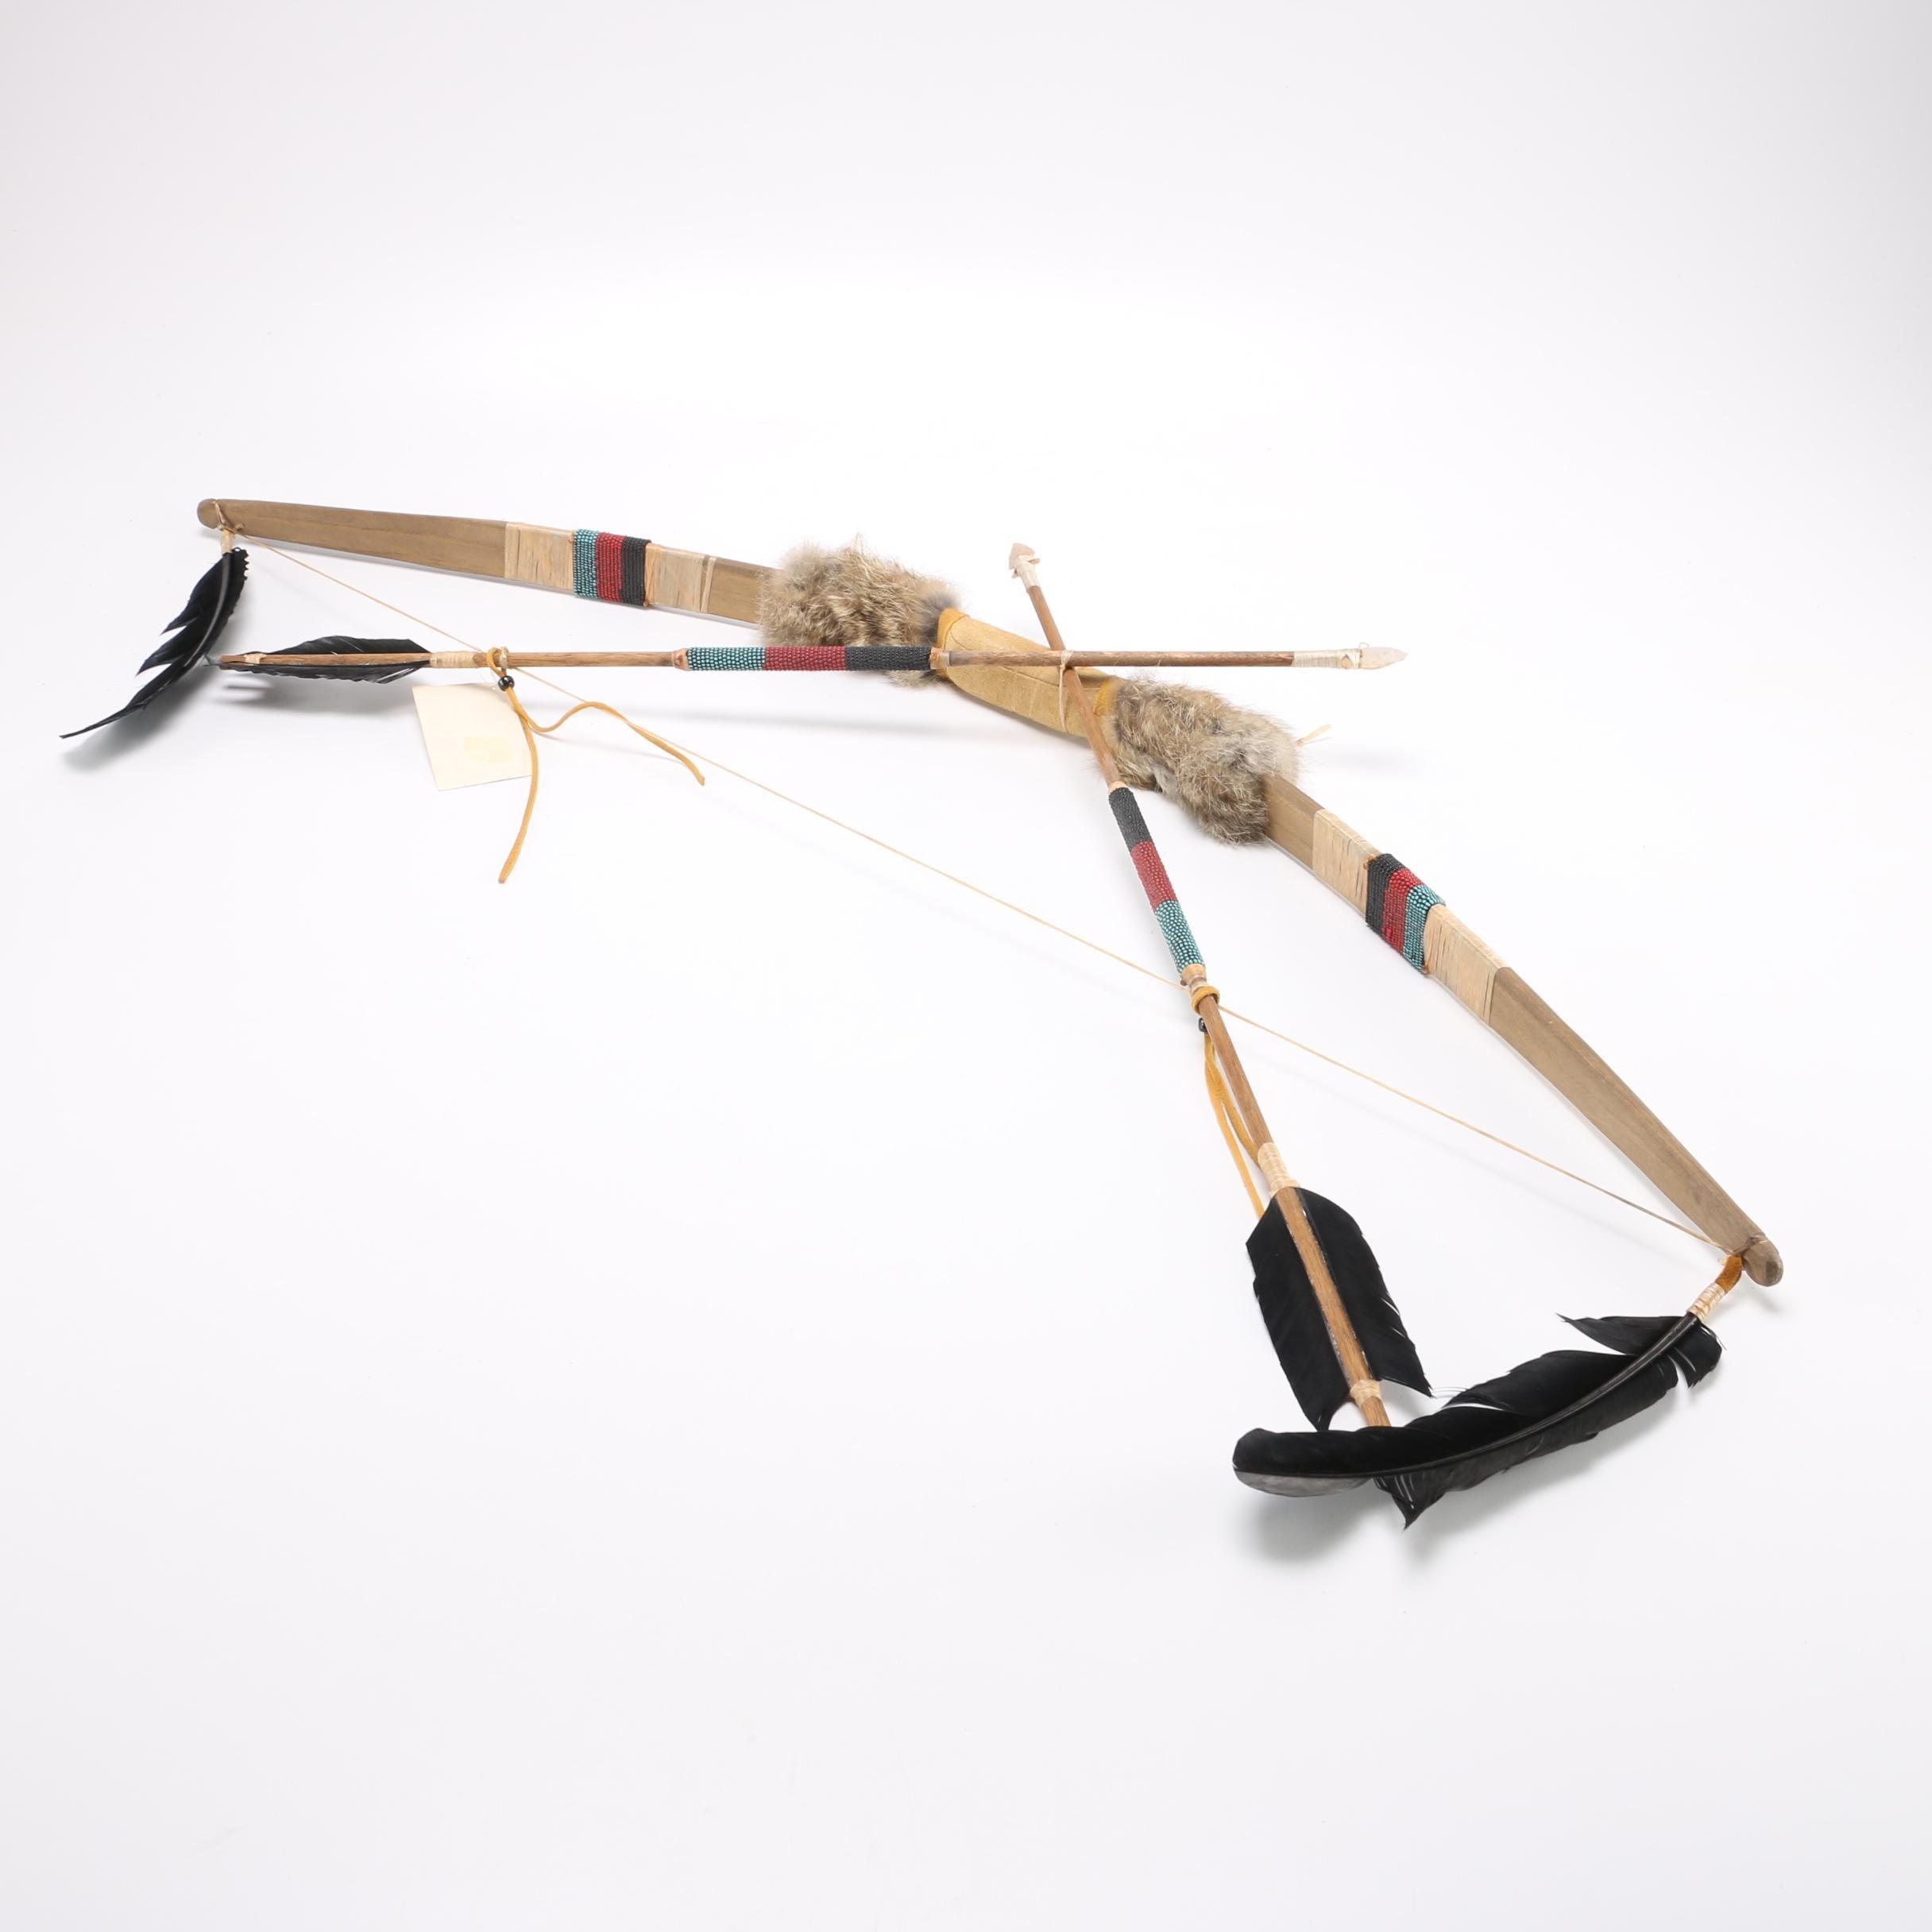 Navajo Bow and Arrow Reproduction